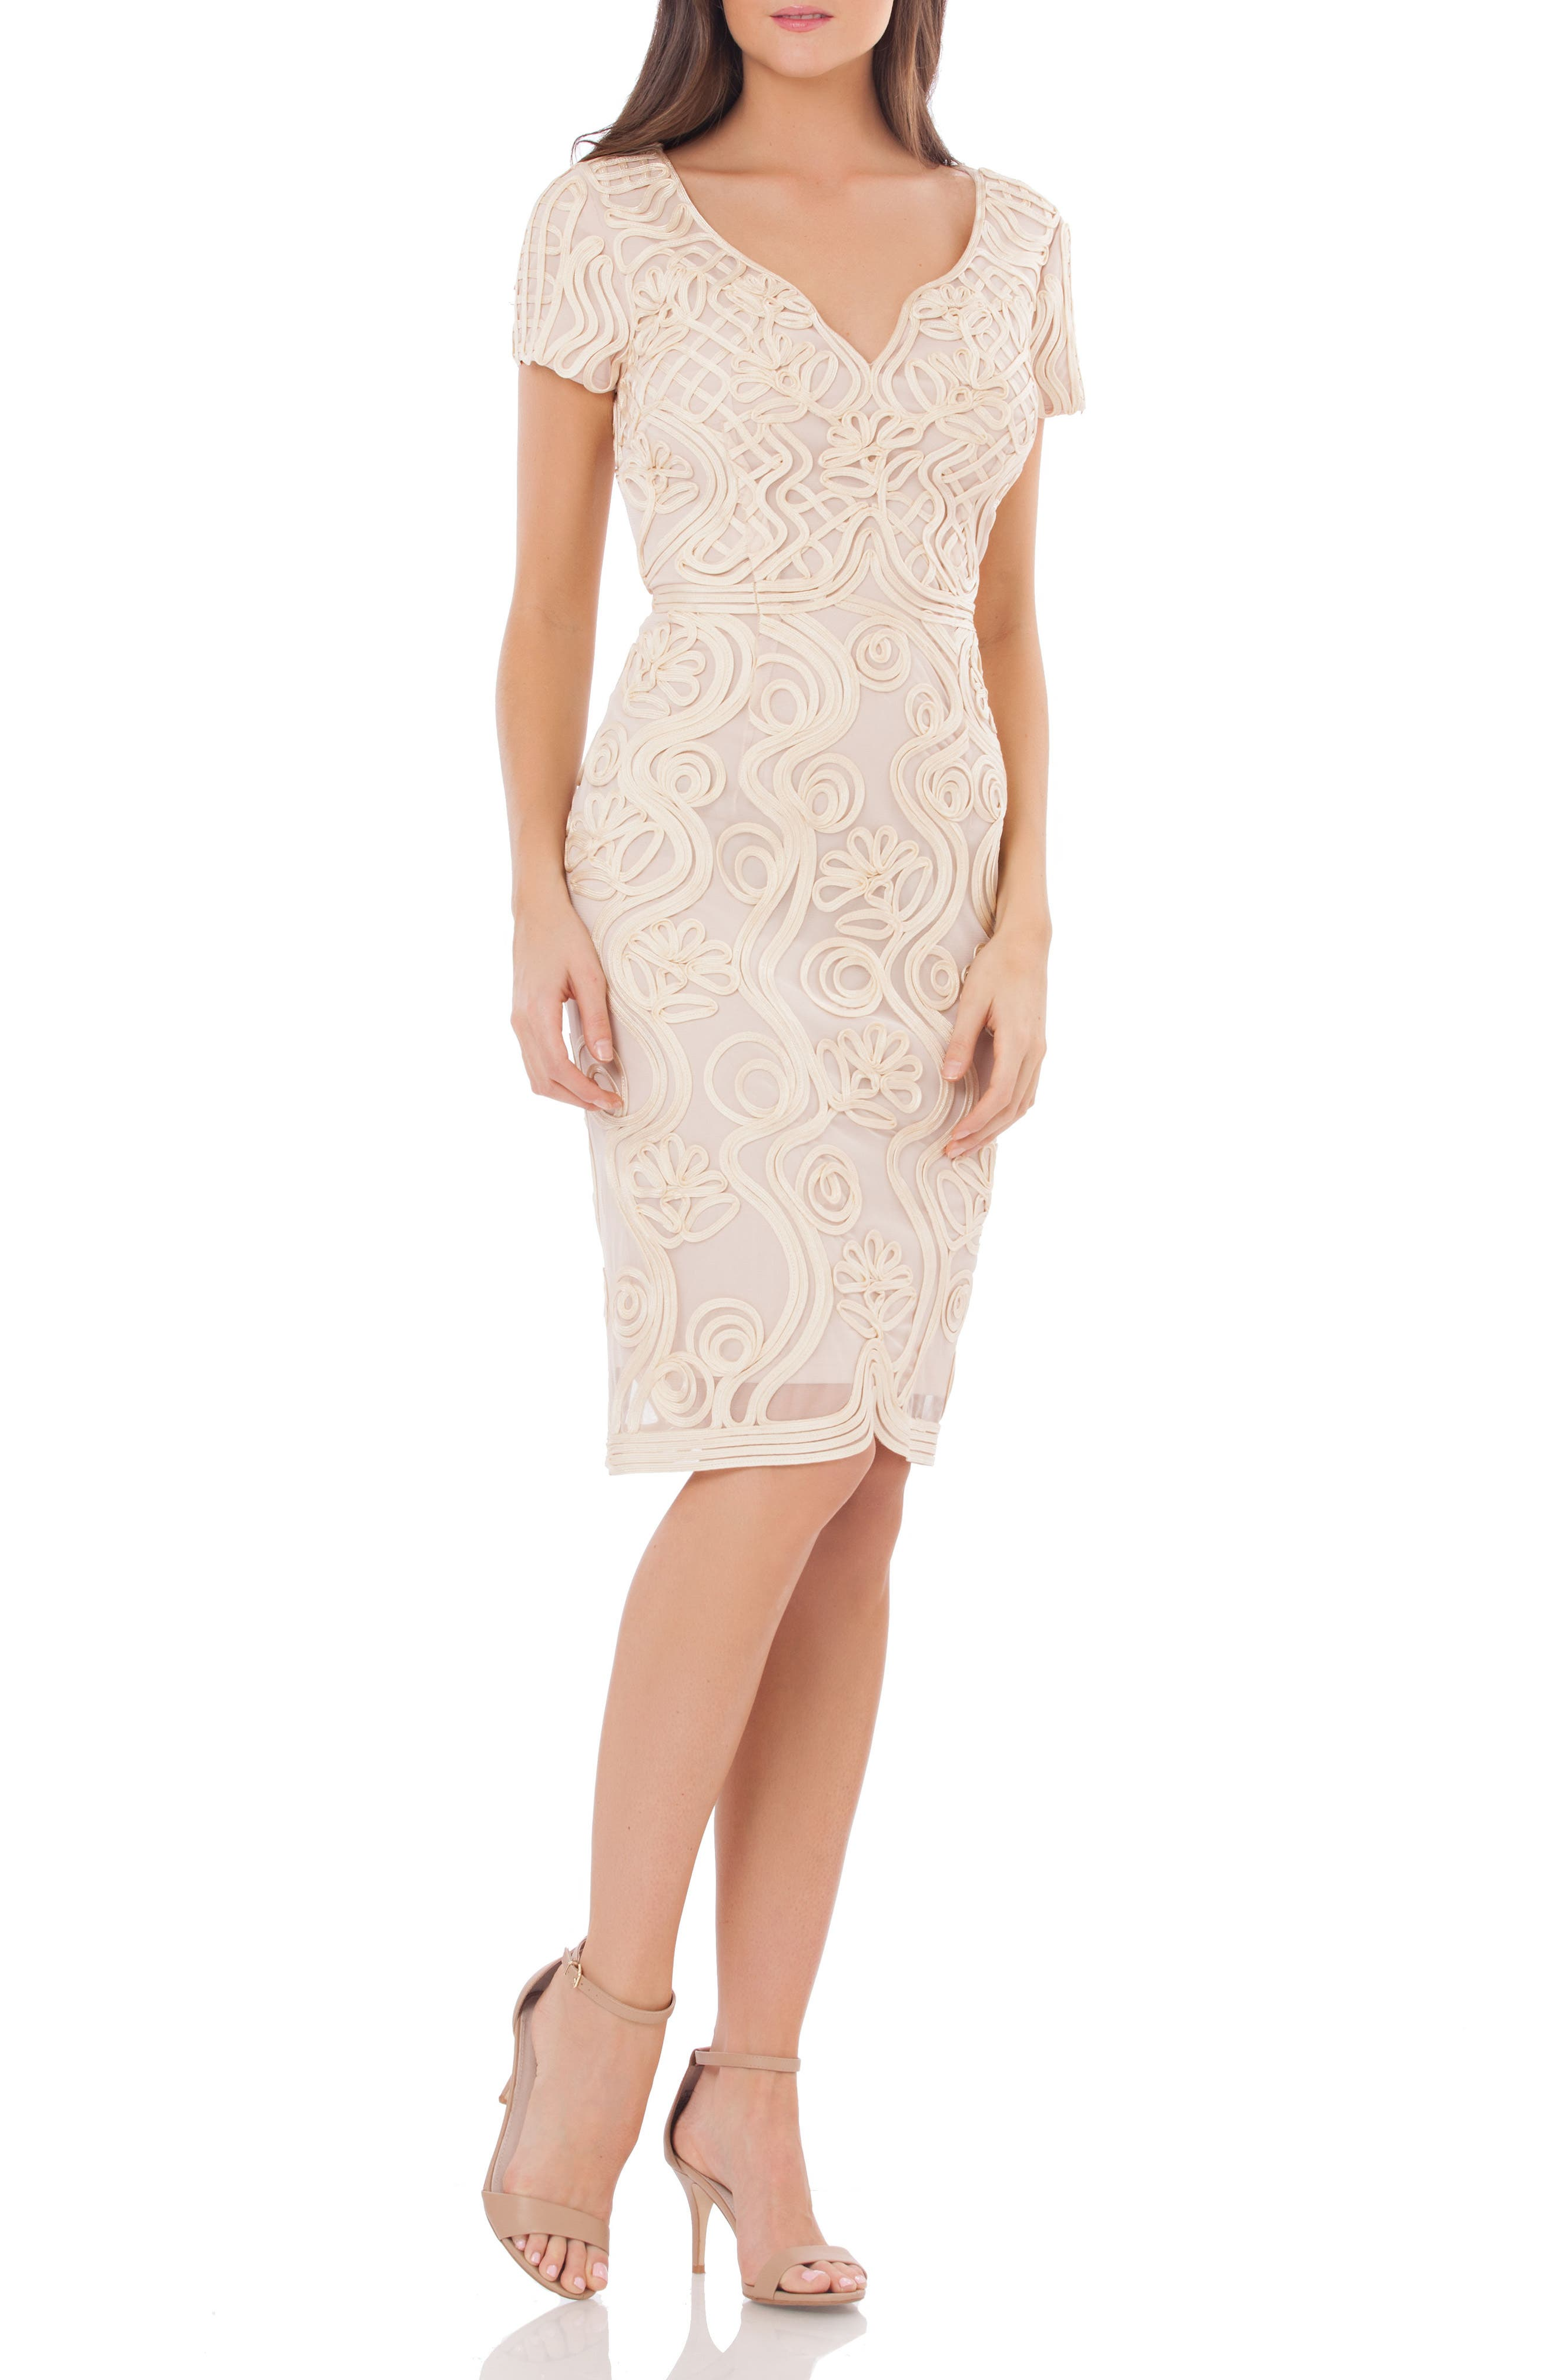 Js Collections Soutache Mesh Sheath Dress, Pink